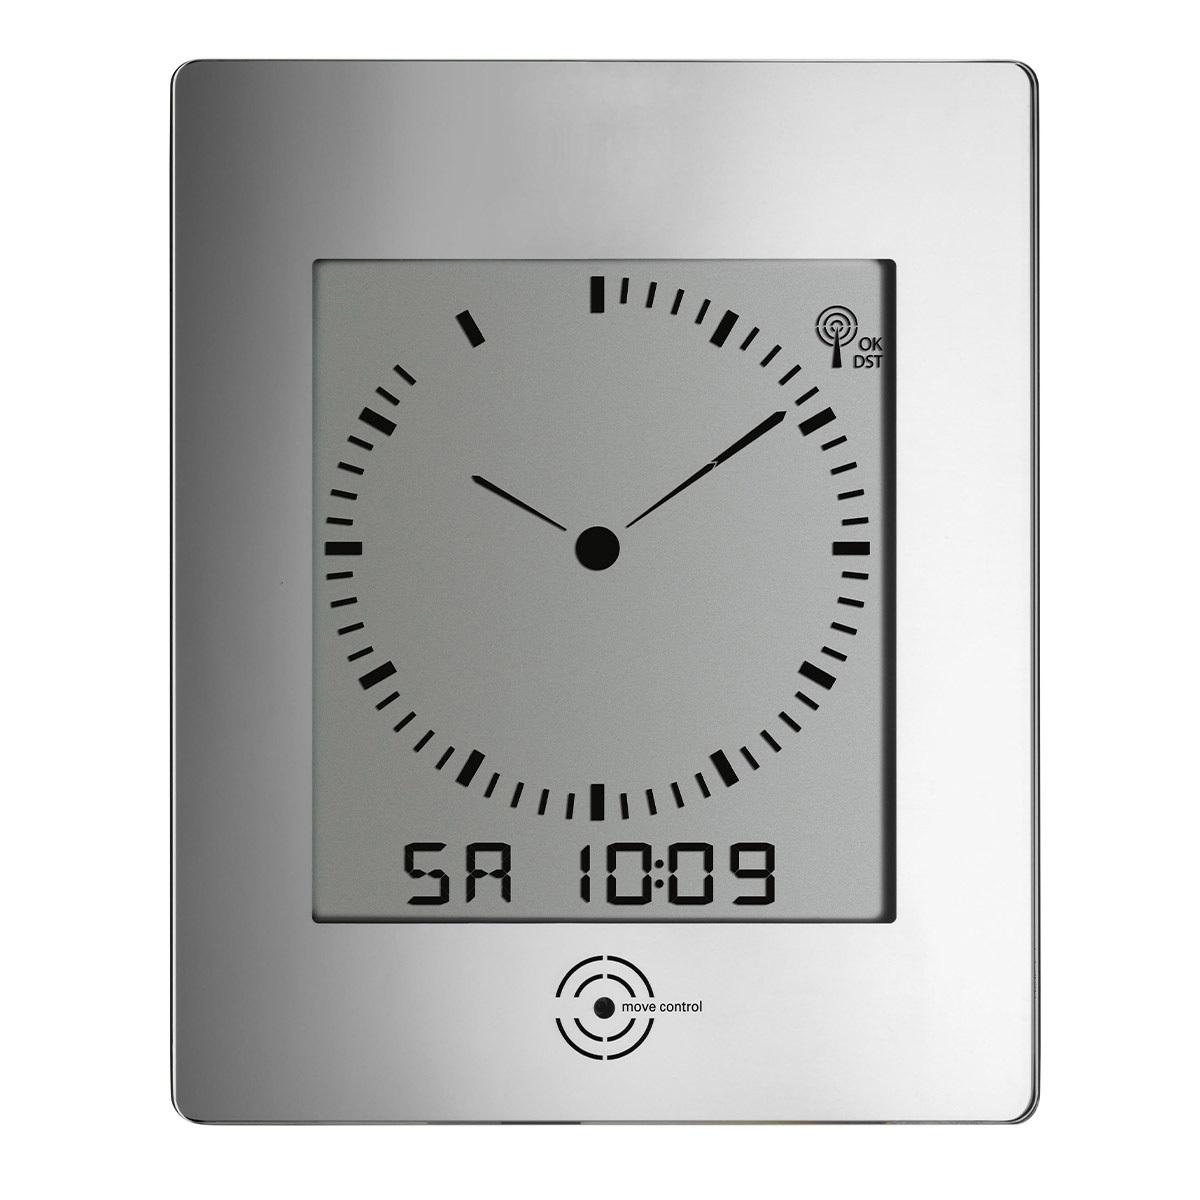 60-4507-digitale-funk-wanduhr-mit-analogem-zifferblatt-raumklima-datum-ansicht-1200x1200px.jpg